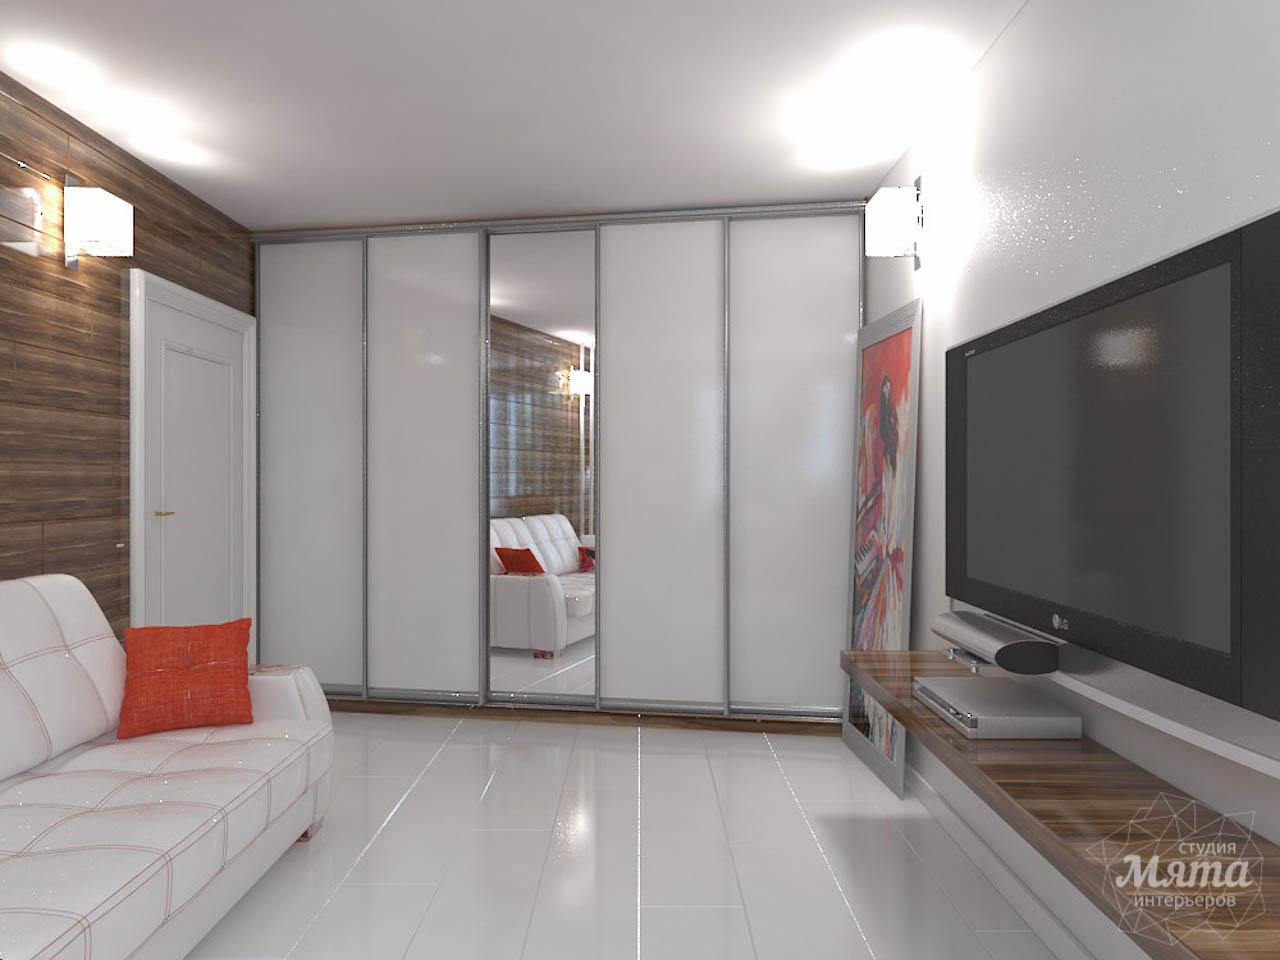 дизайн интерьера квартиры в стиле минимализм